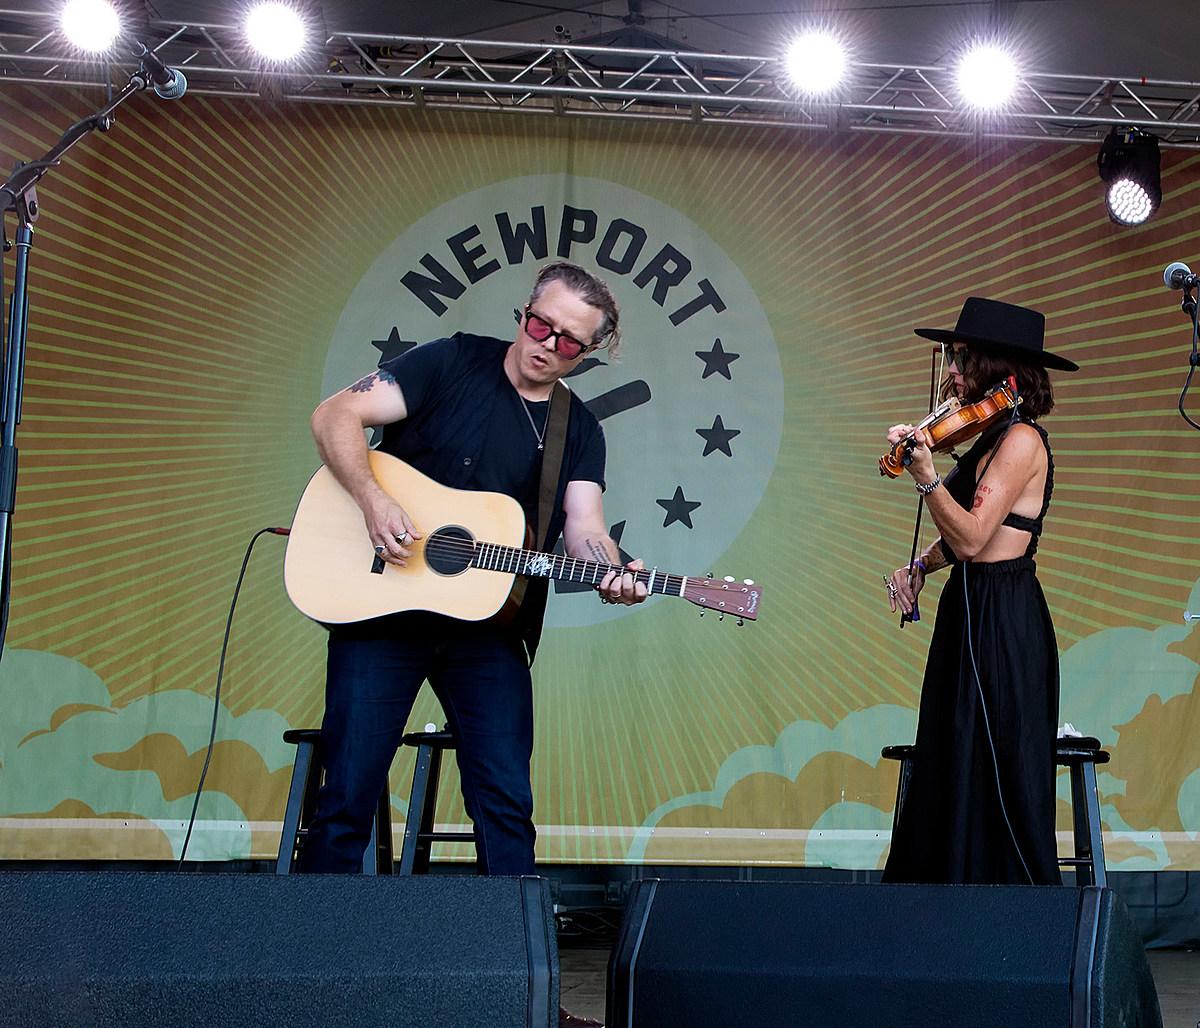 Newport Folk Festival 2021 day 2 pics & video (Jason Isbell, Randy Newman, Waxahatchee, more)